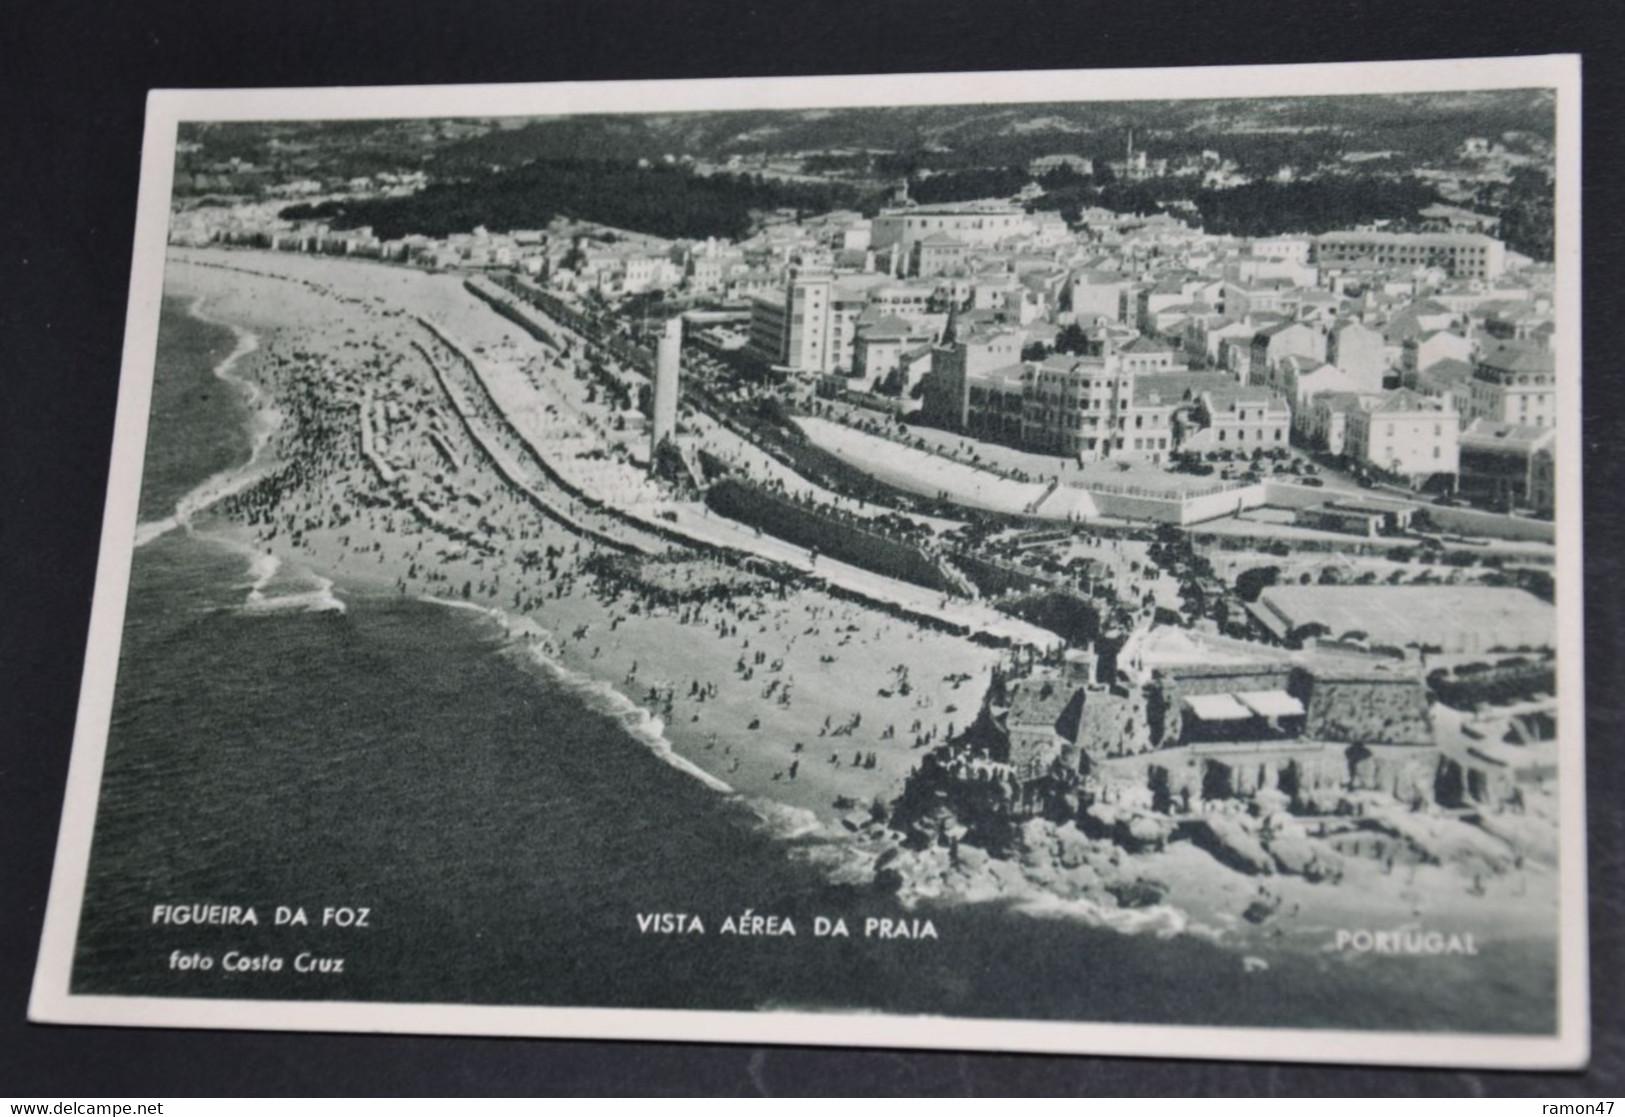 Figueira Da Foz - Vista Aérea Da Praia - Coimbra